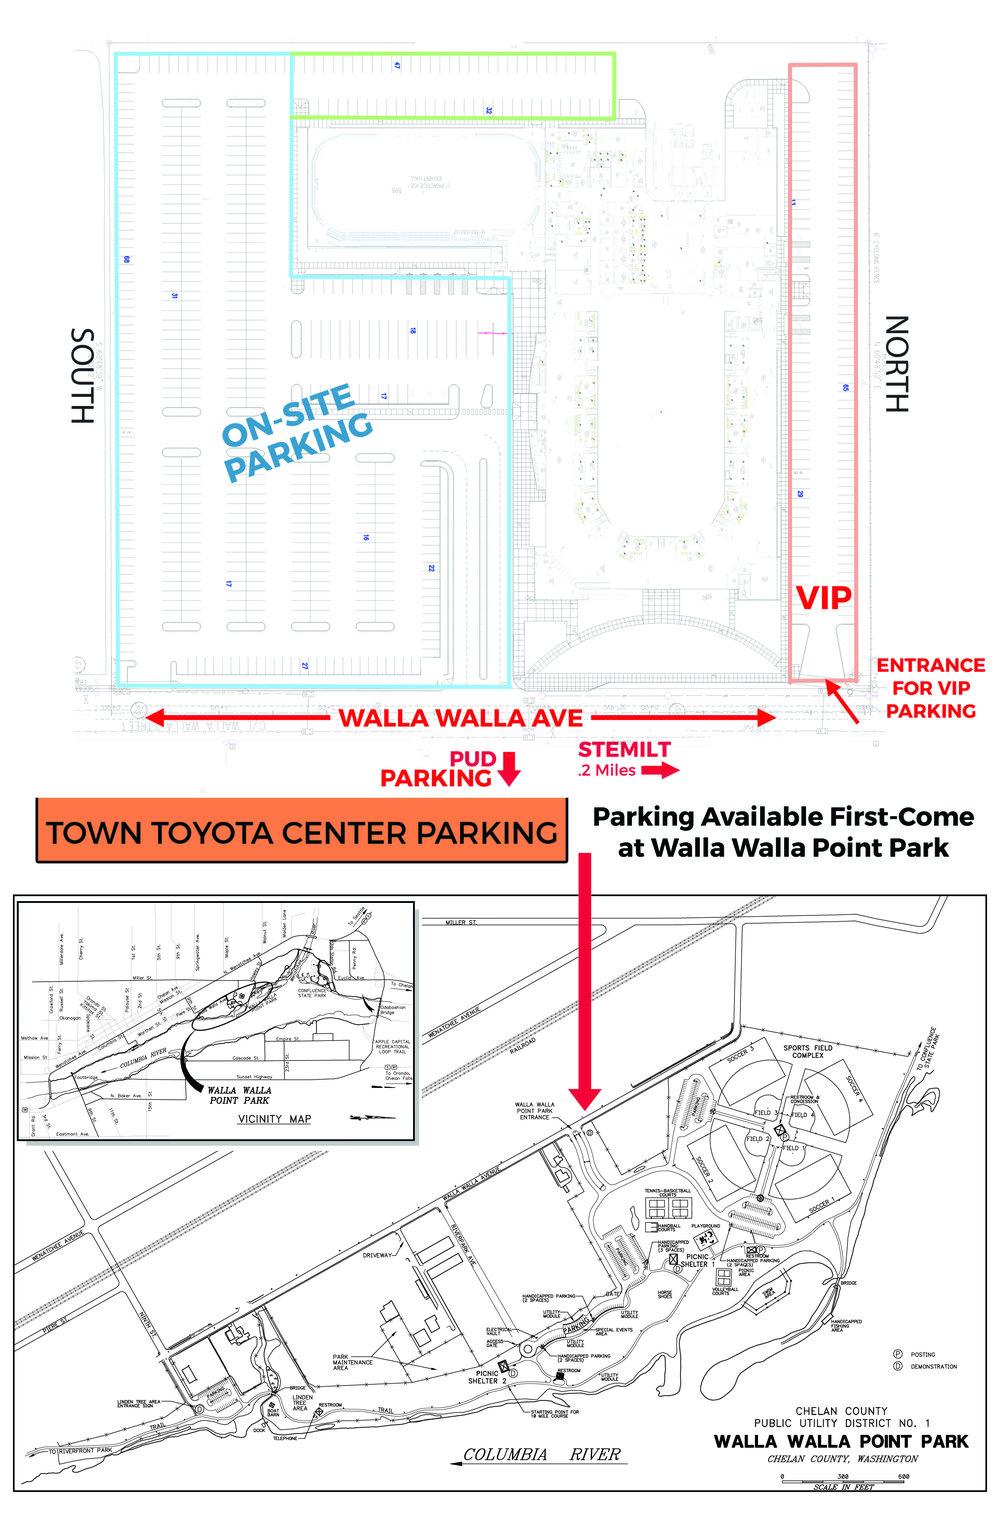 TTC parking map for website.jpg